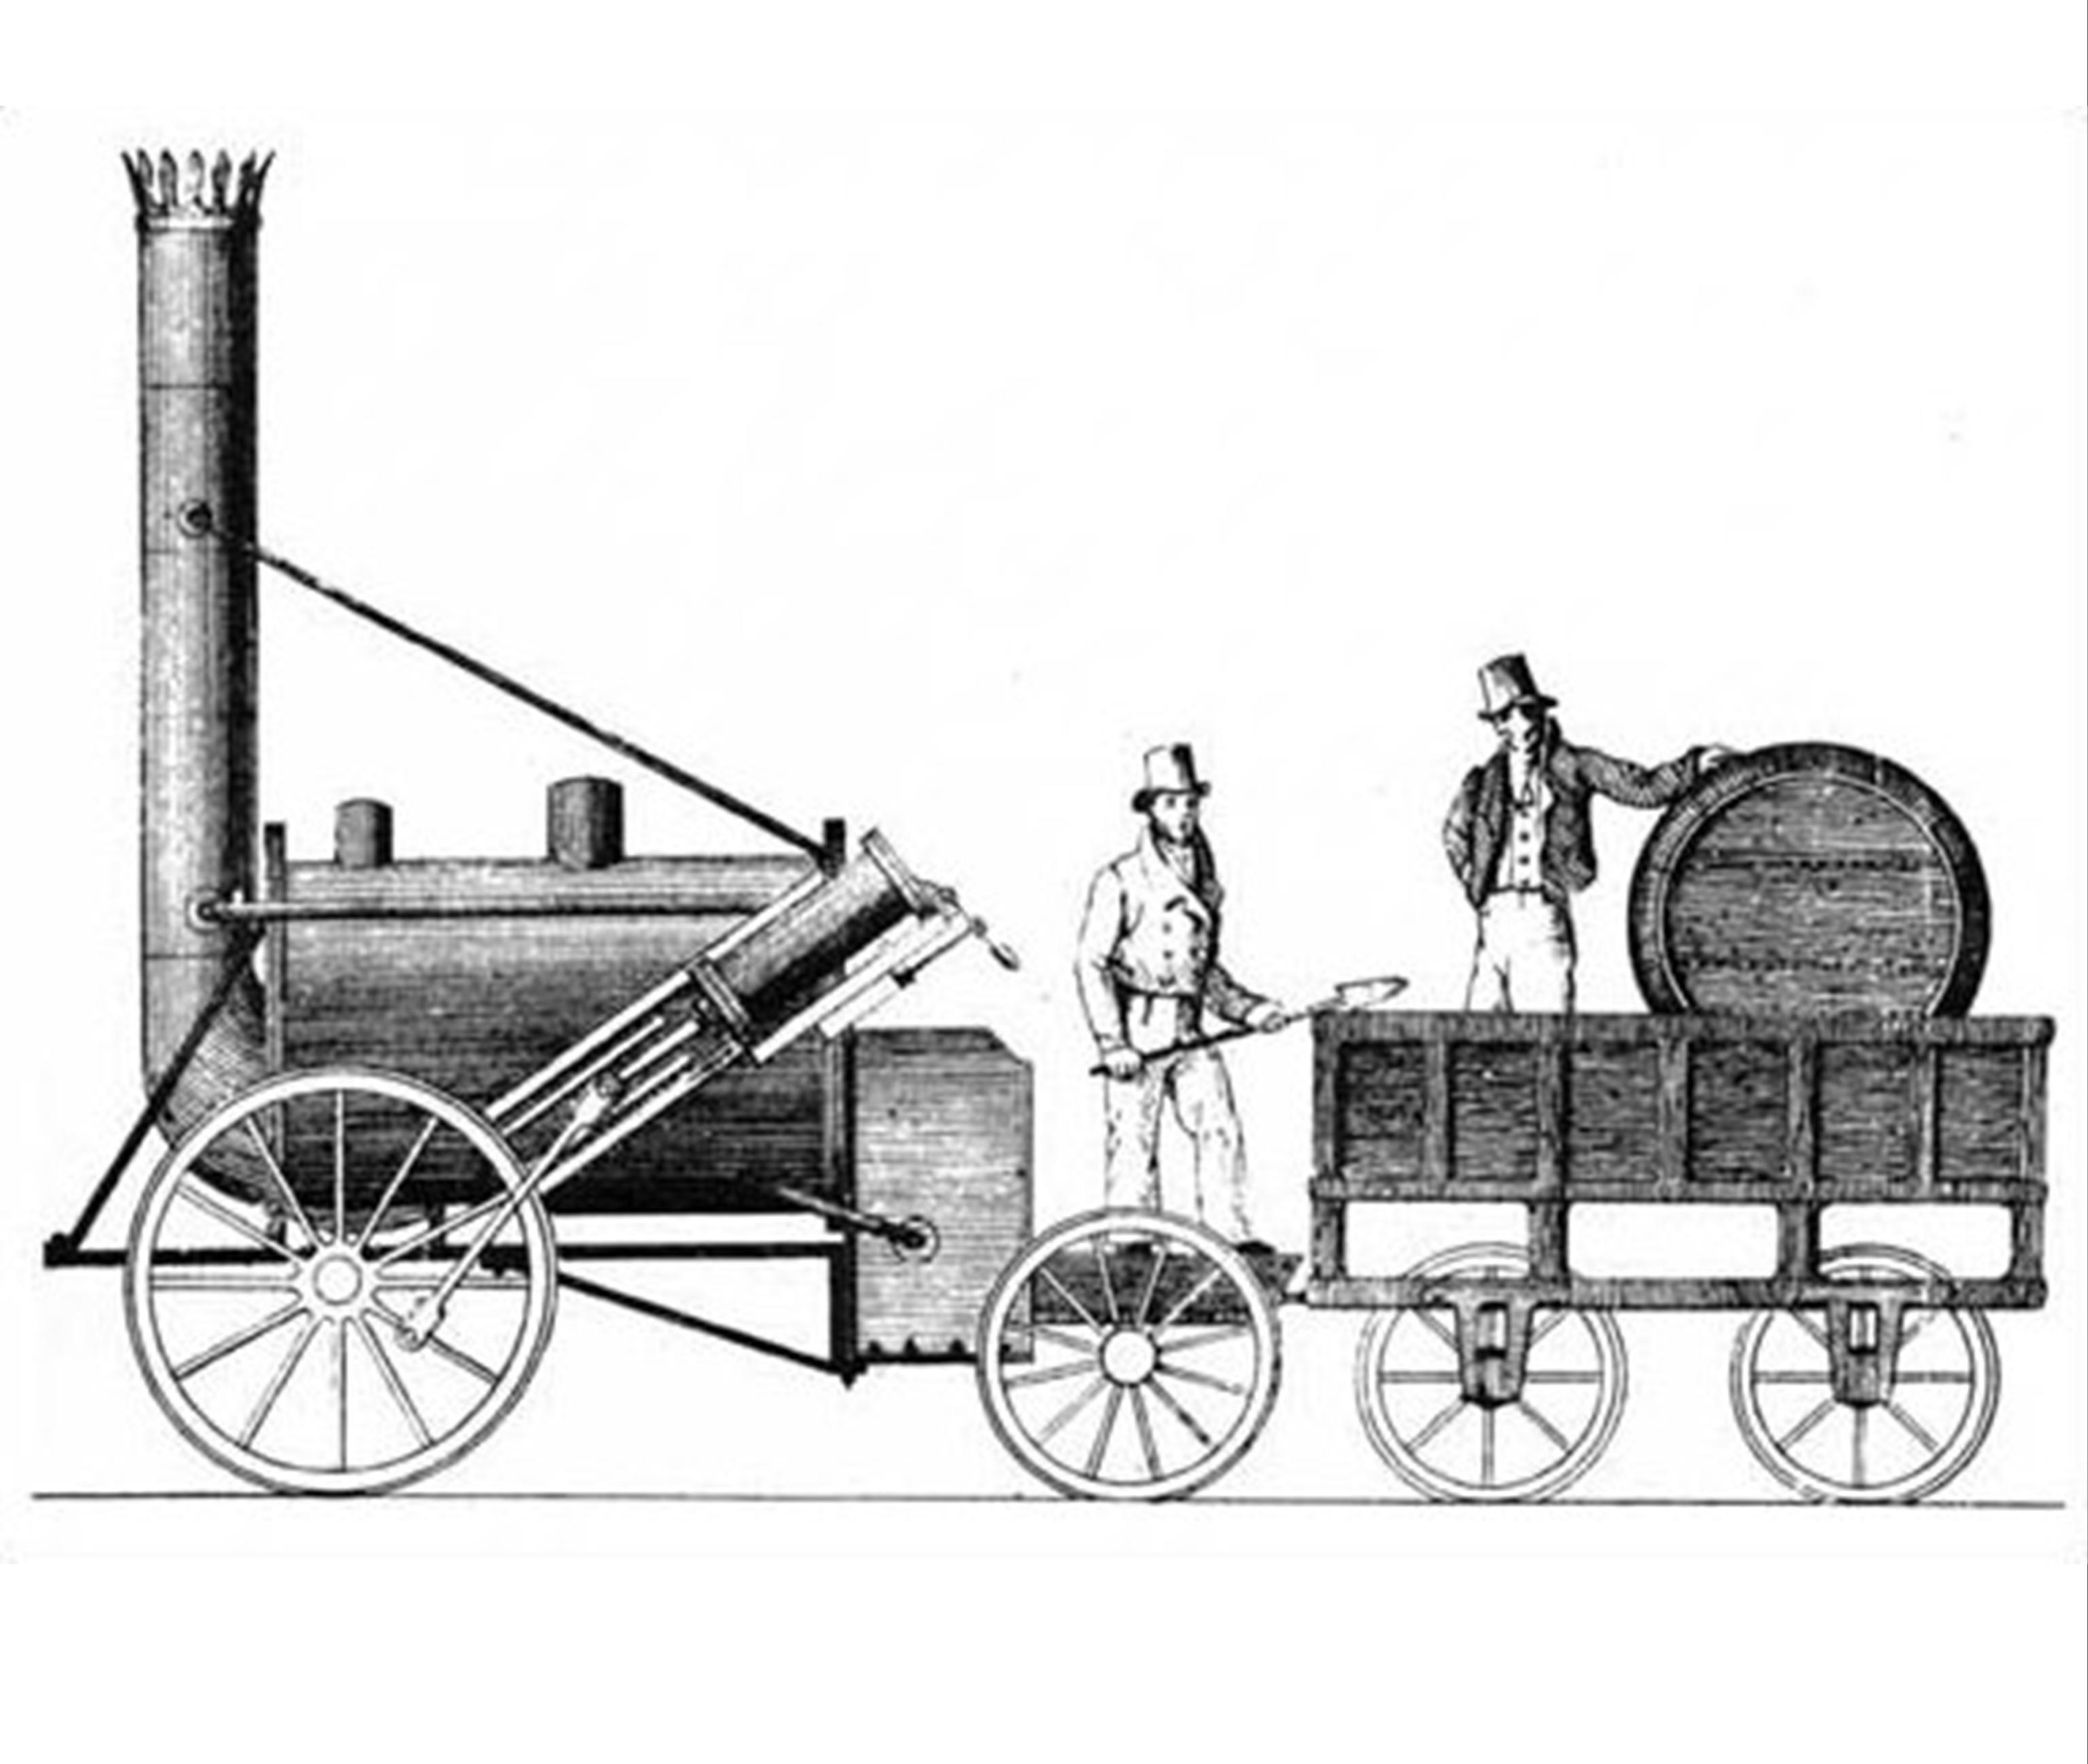 First Steam Locomotive Stephensons Rocket